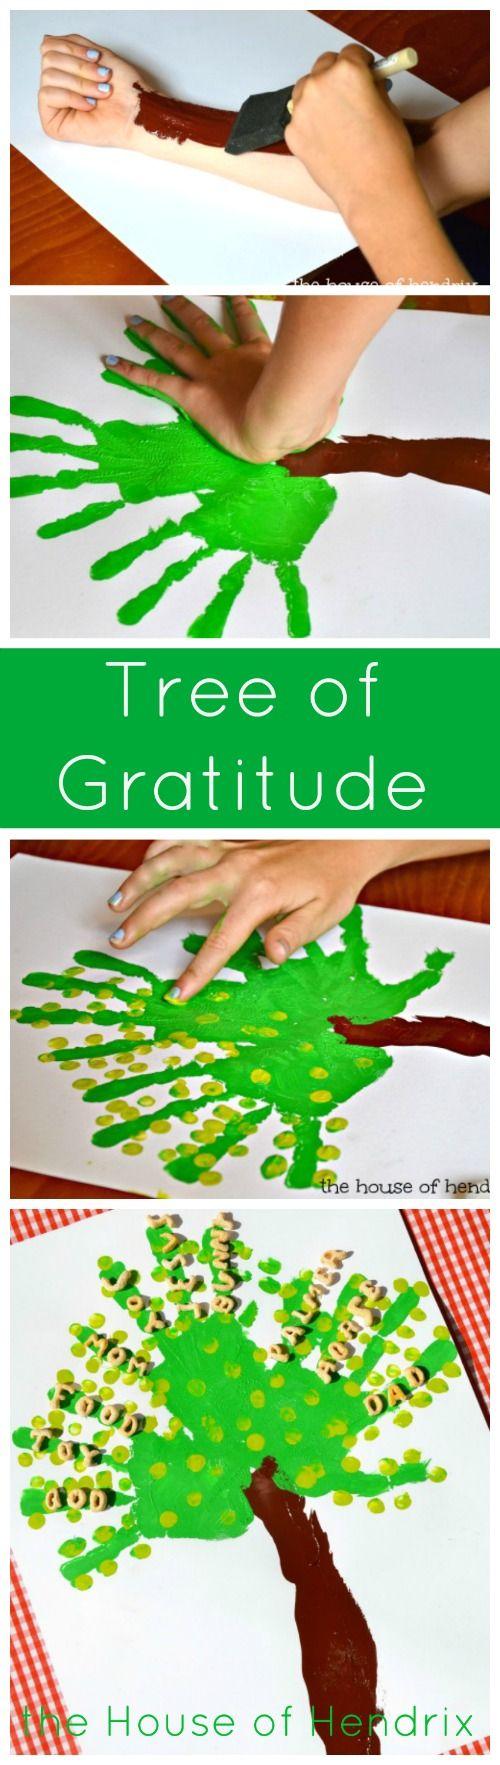 A Tree of Gratitude